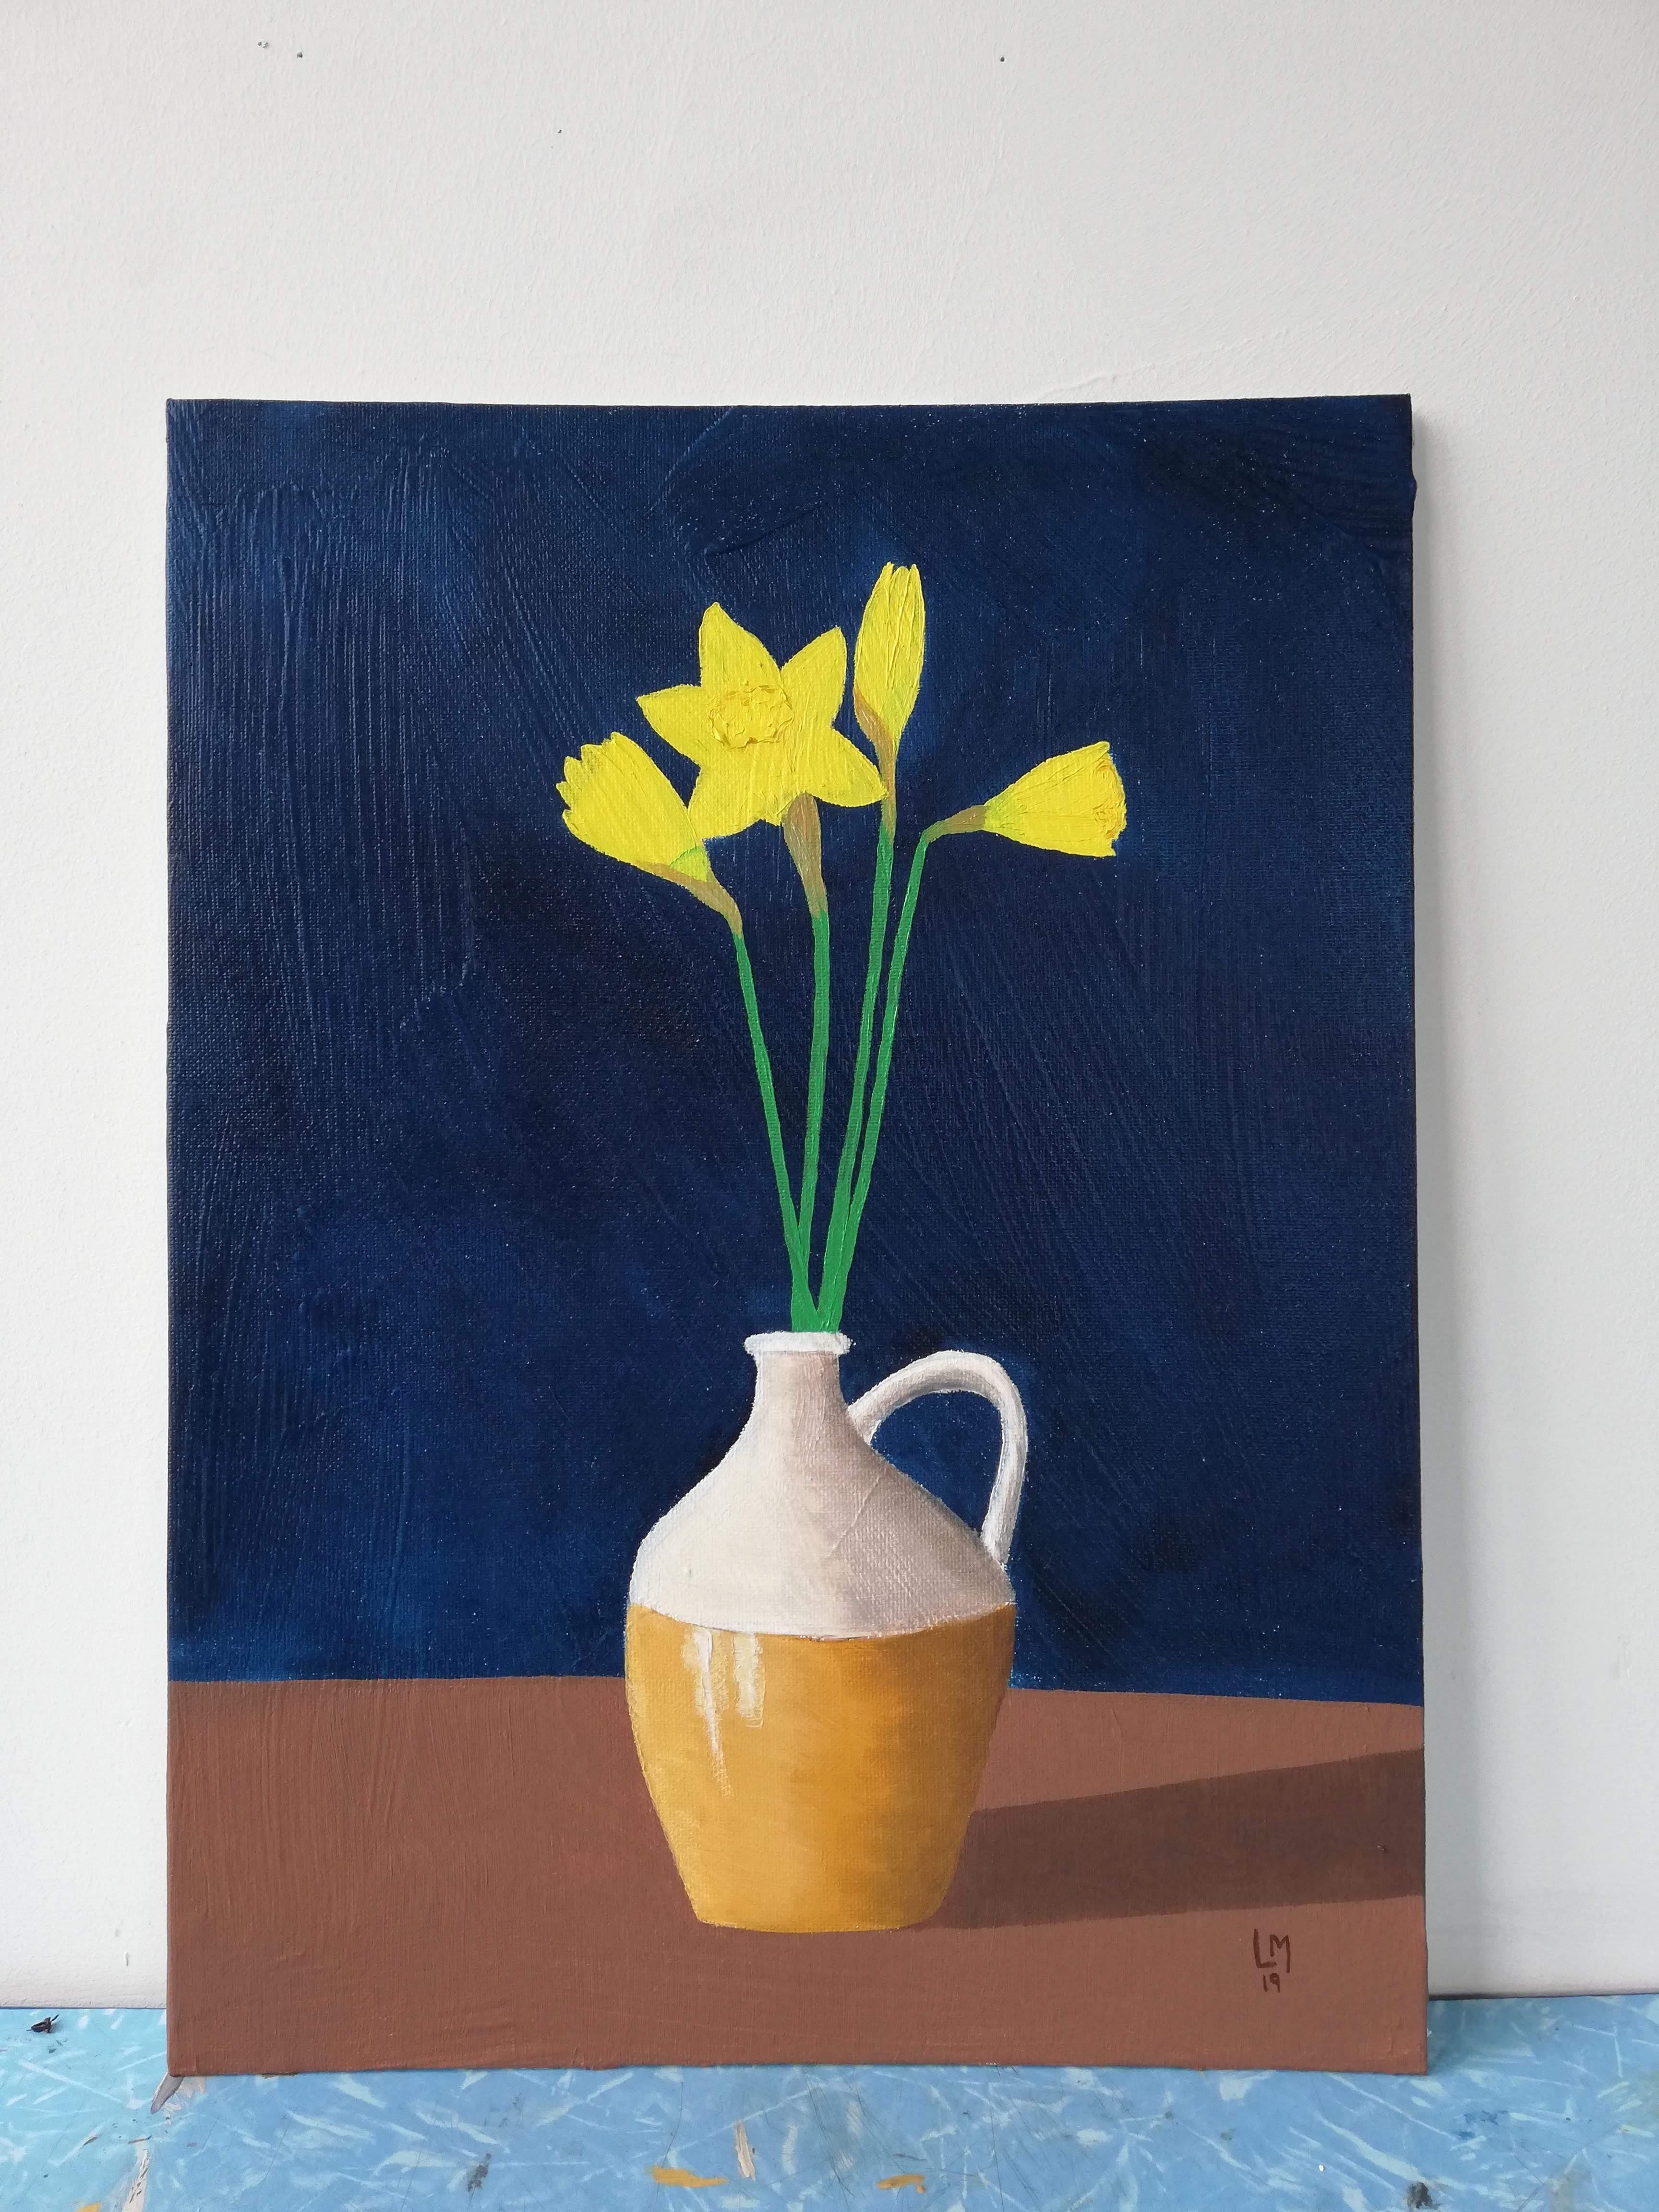 'Daffodils in a Jug'